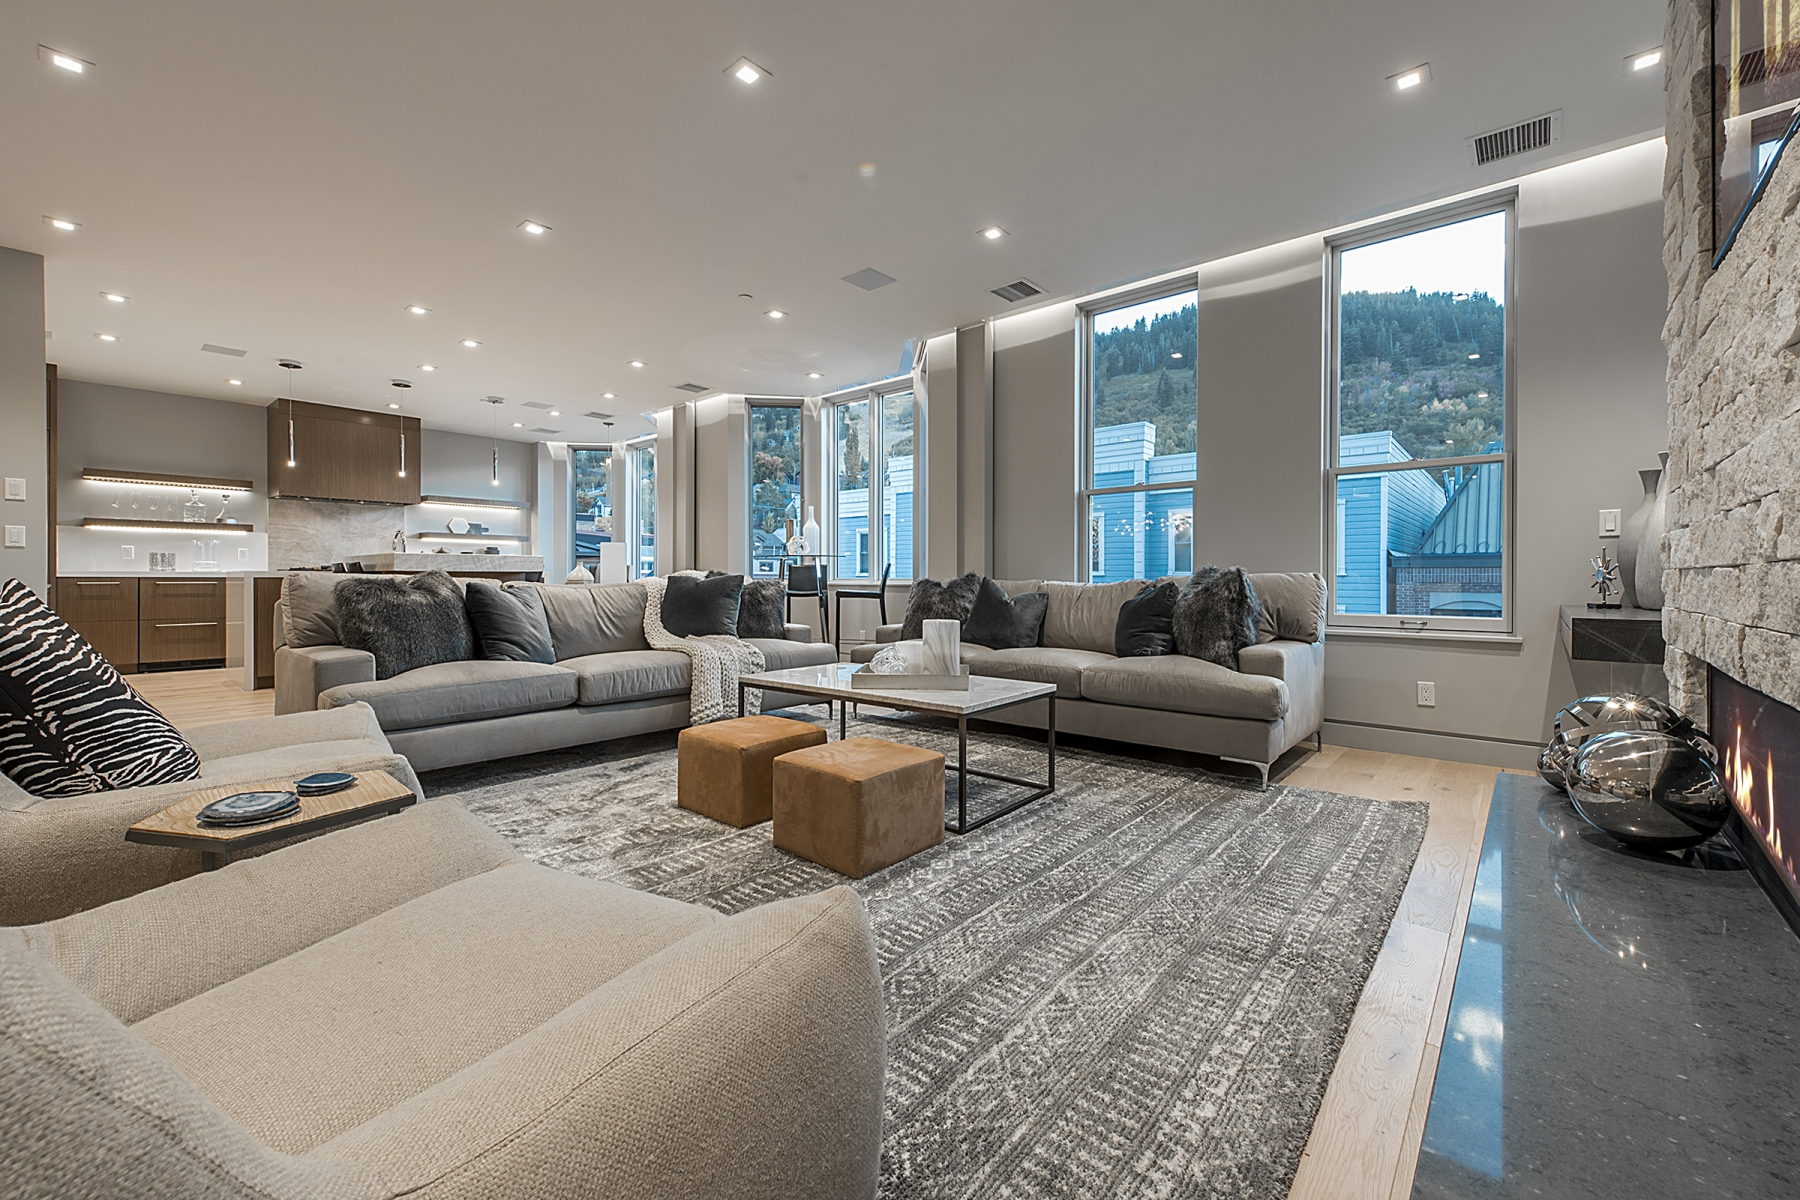 living-room_1800x1200_2443245